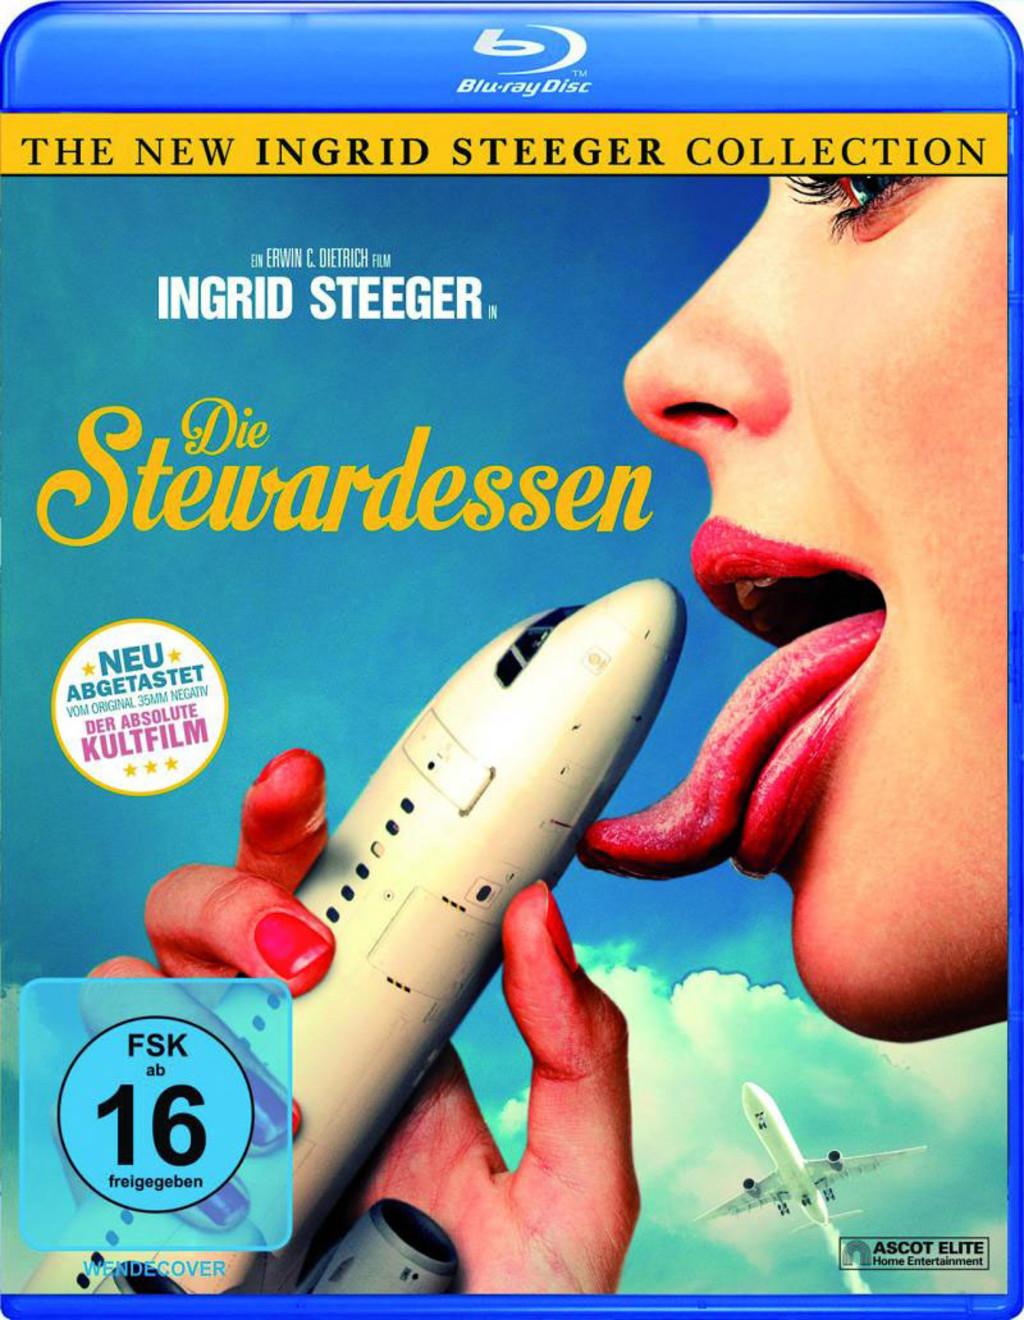 Ingrid Steeger In Stewardesses Report | Hot Girl HD Wallpaper